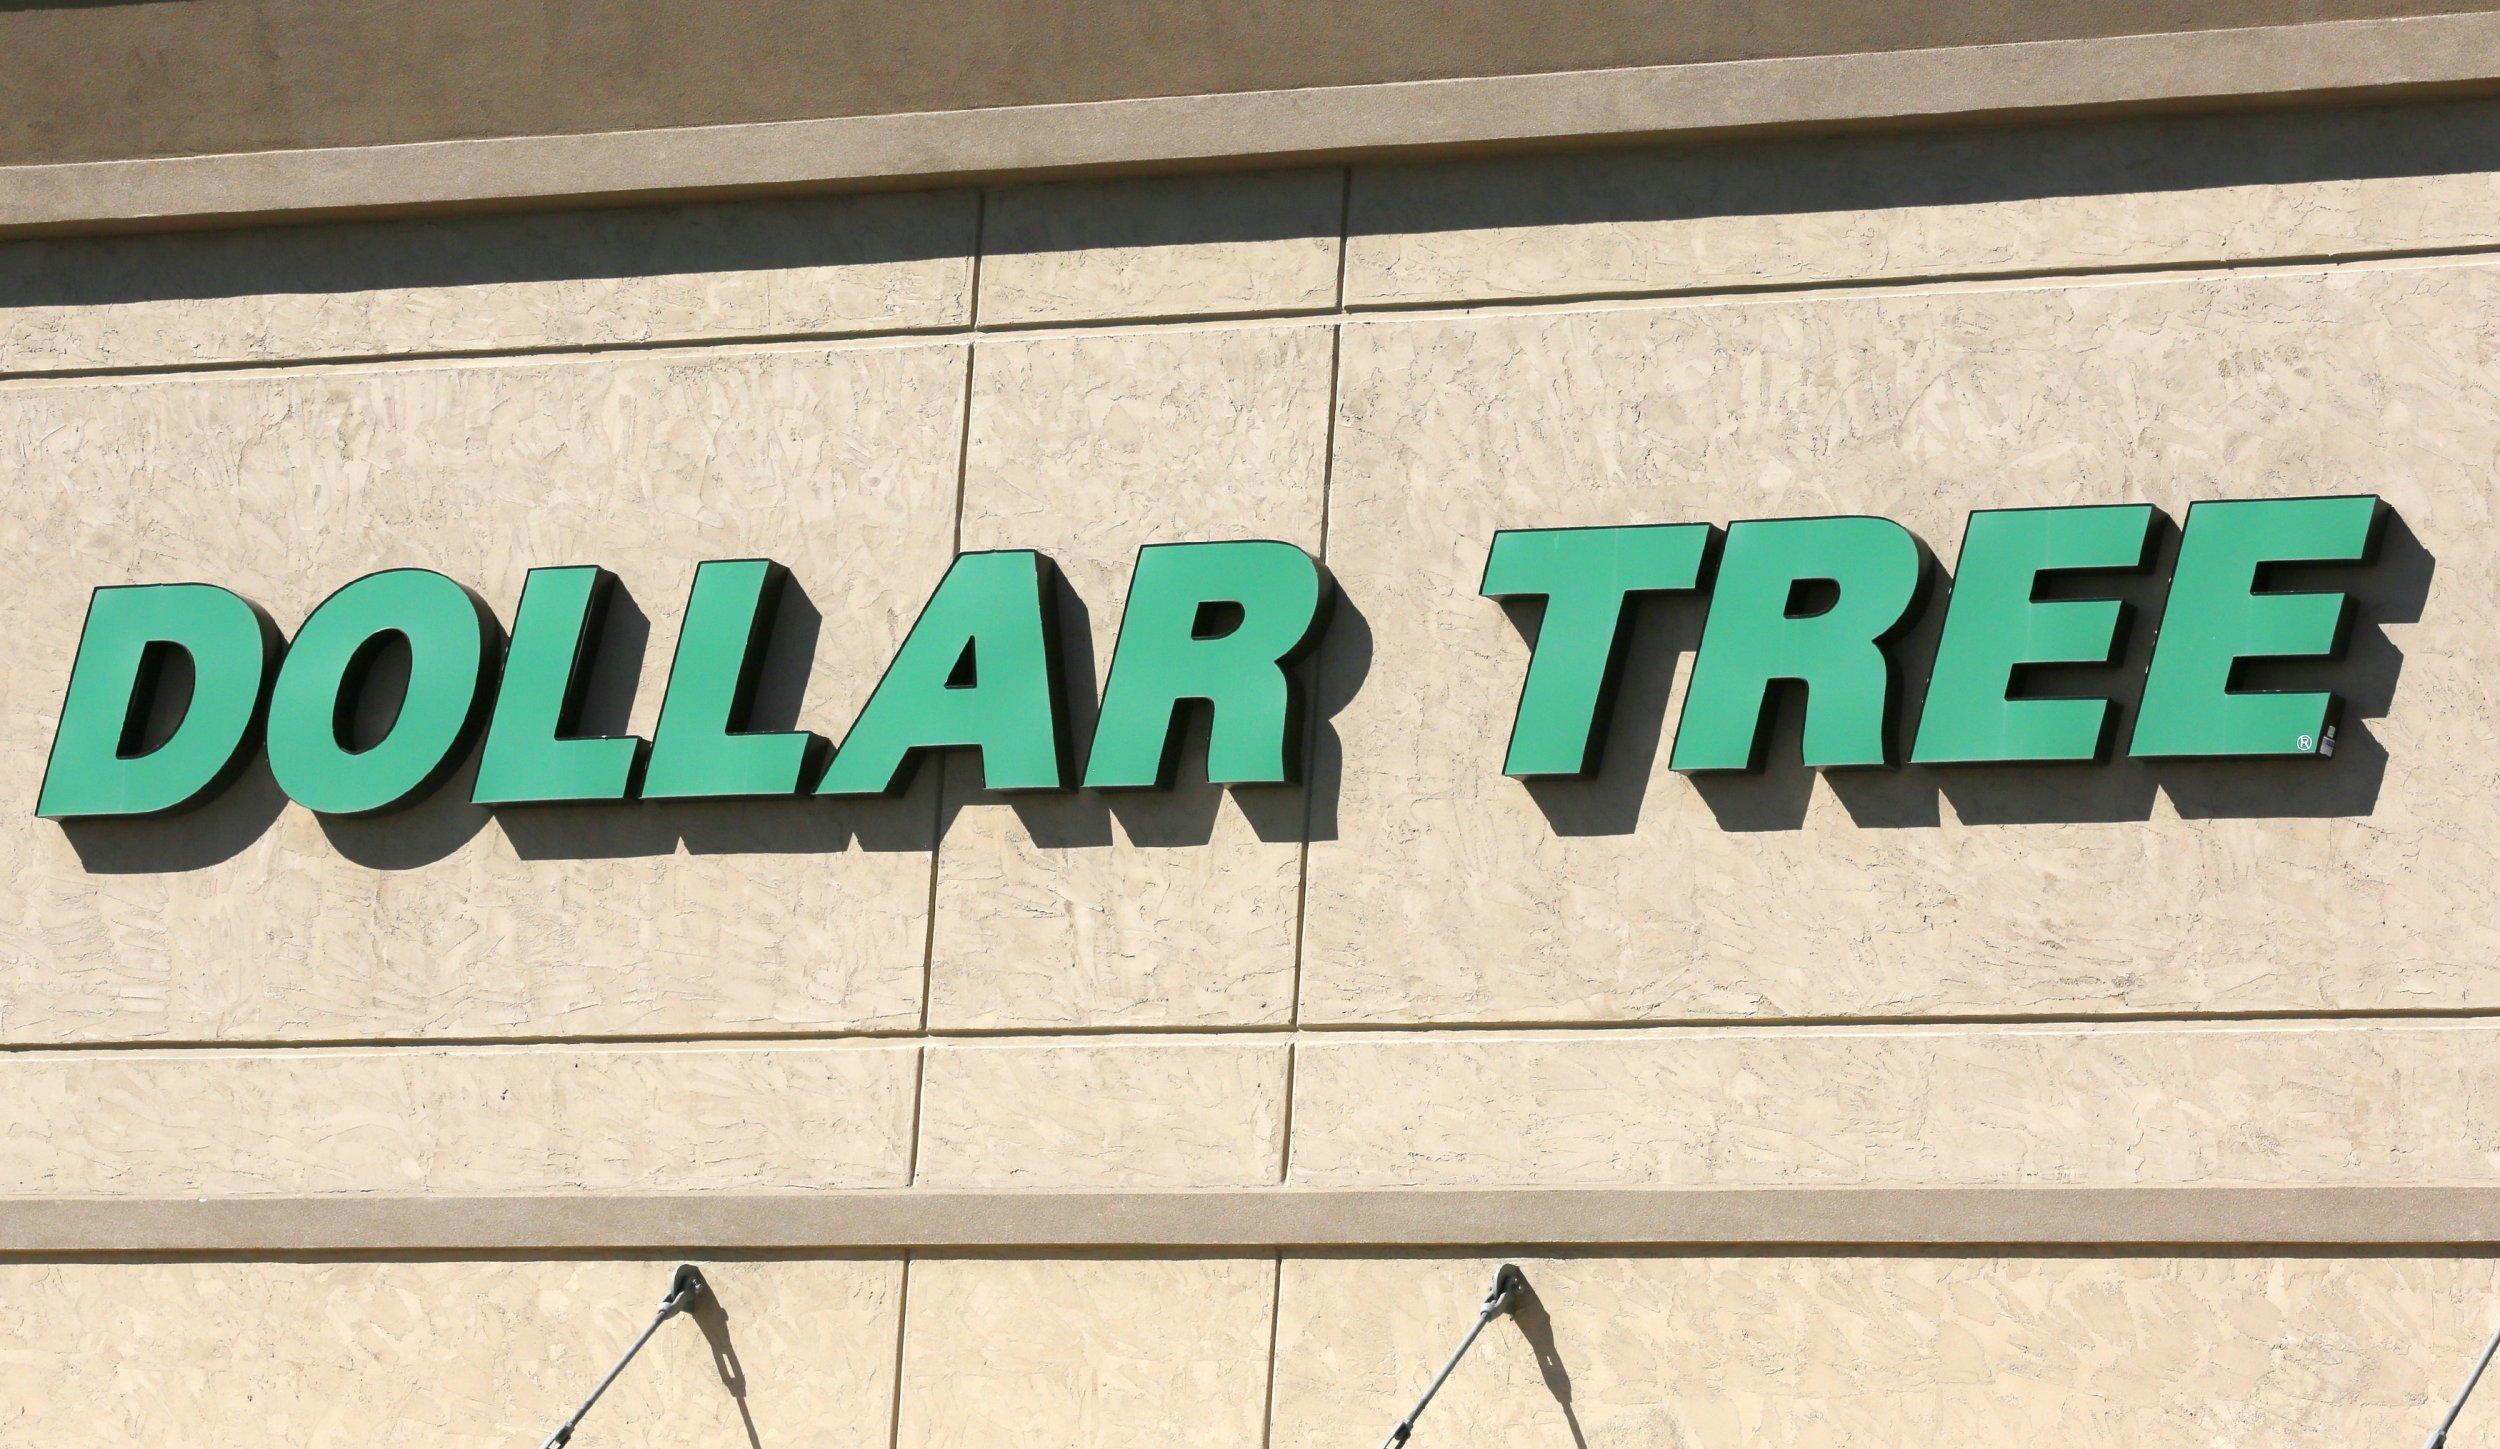 Where to buy dollars